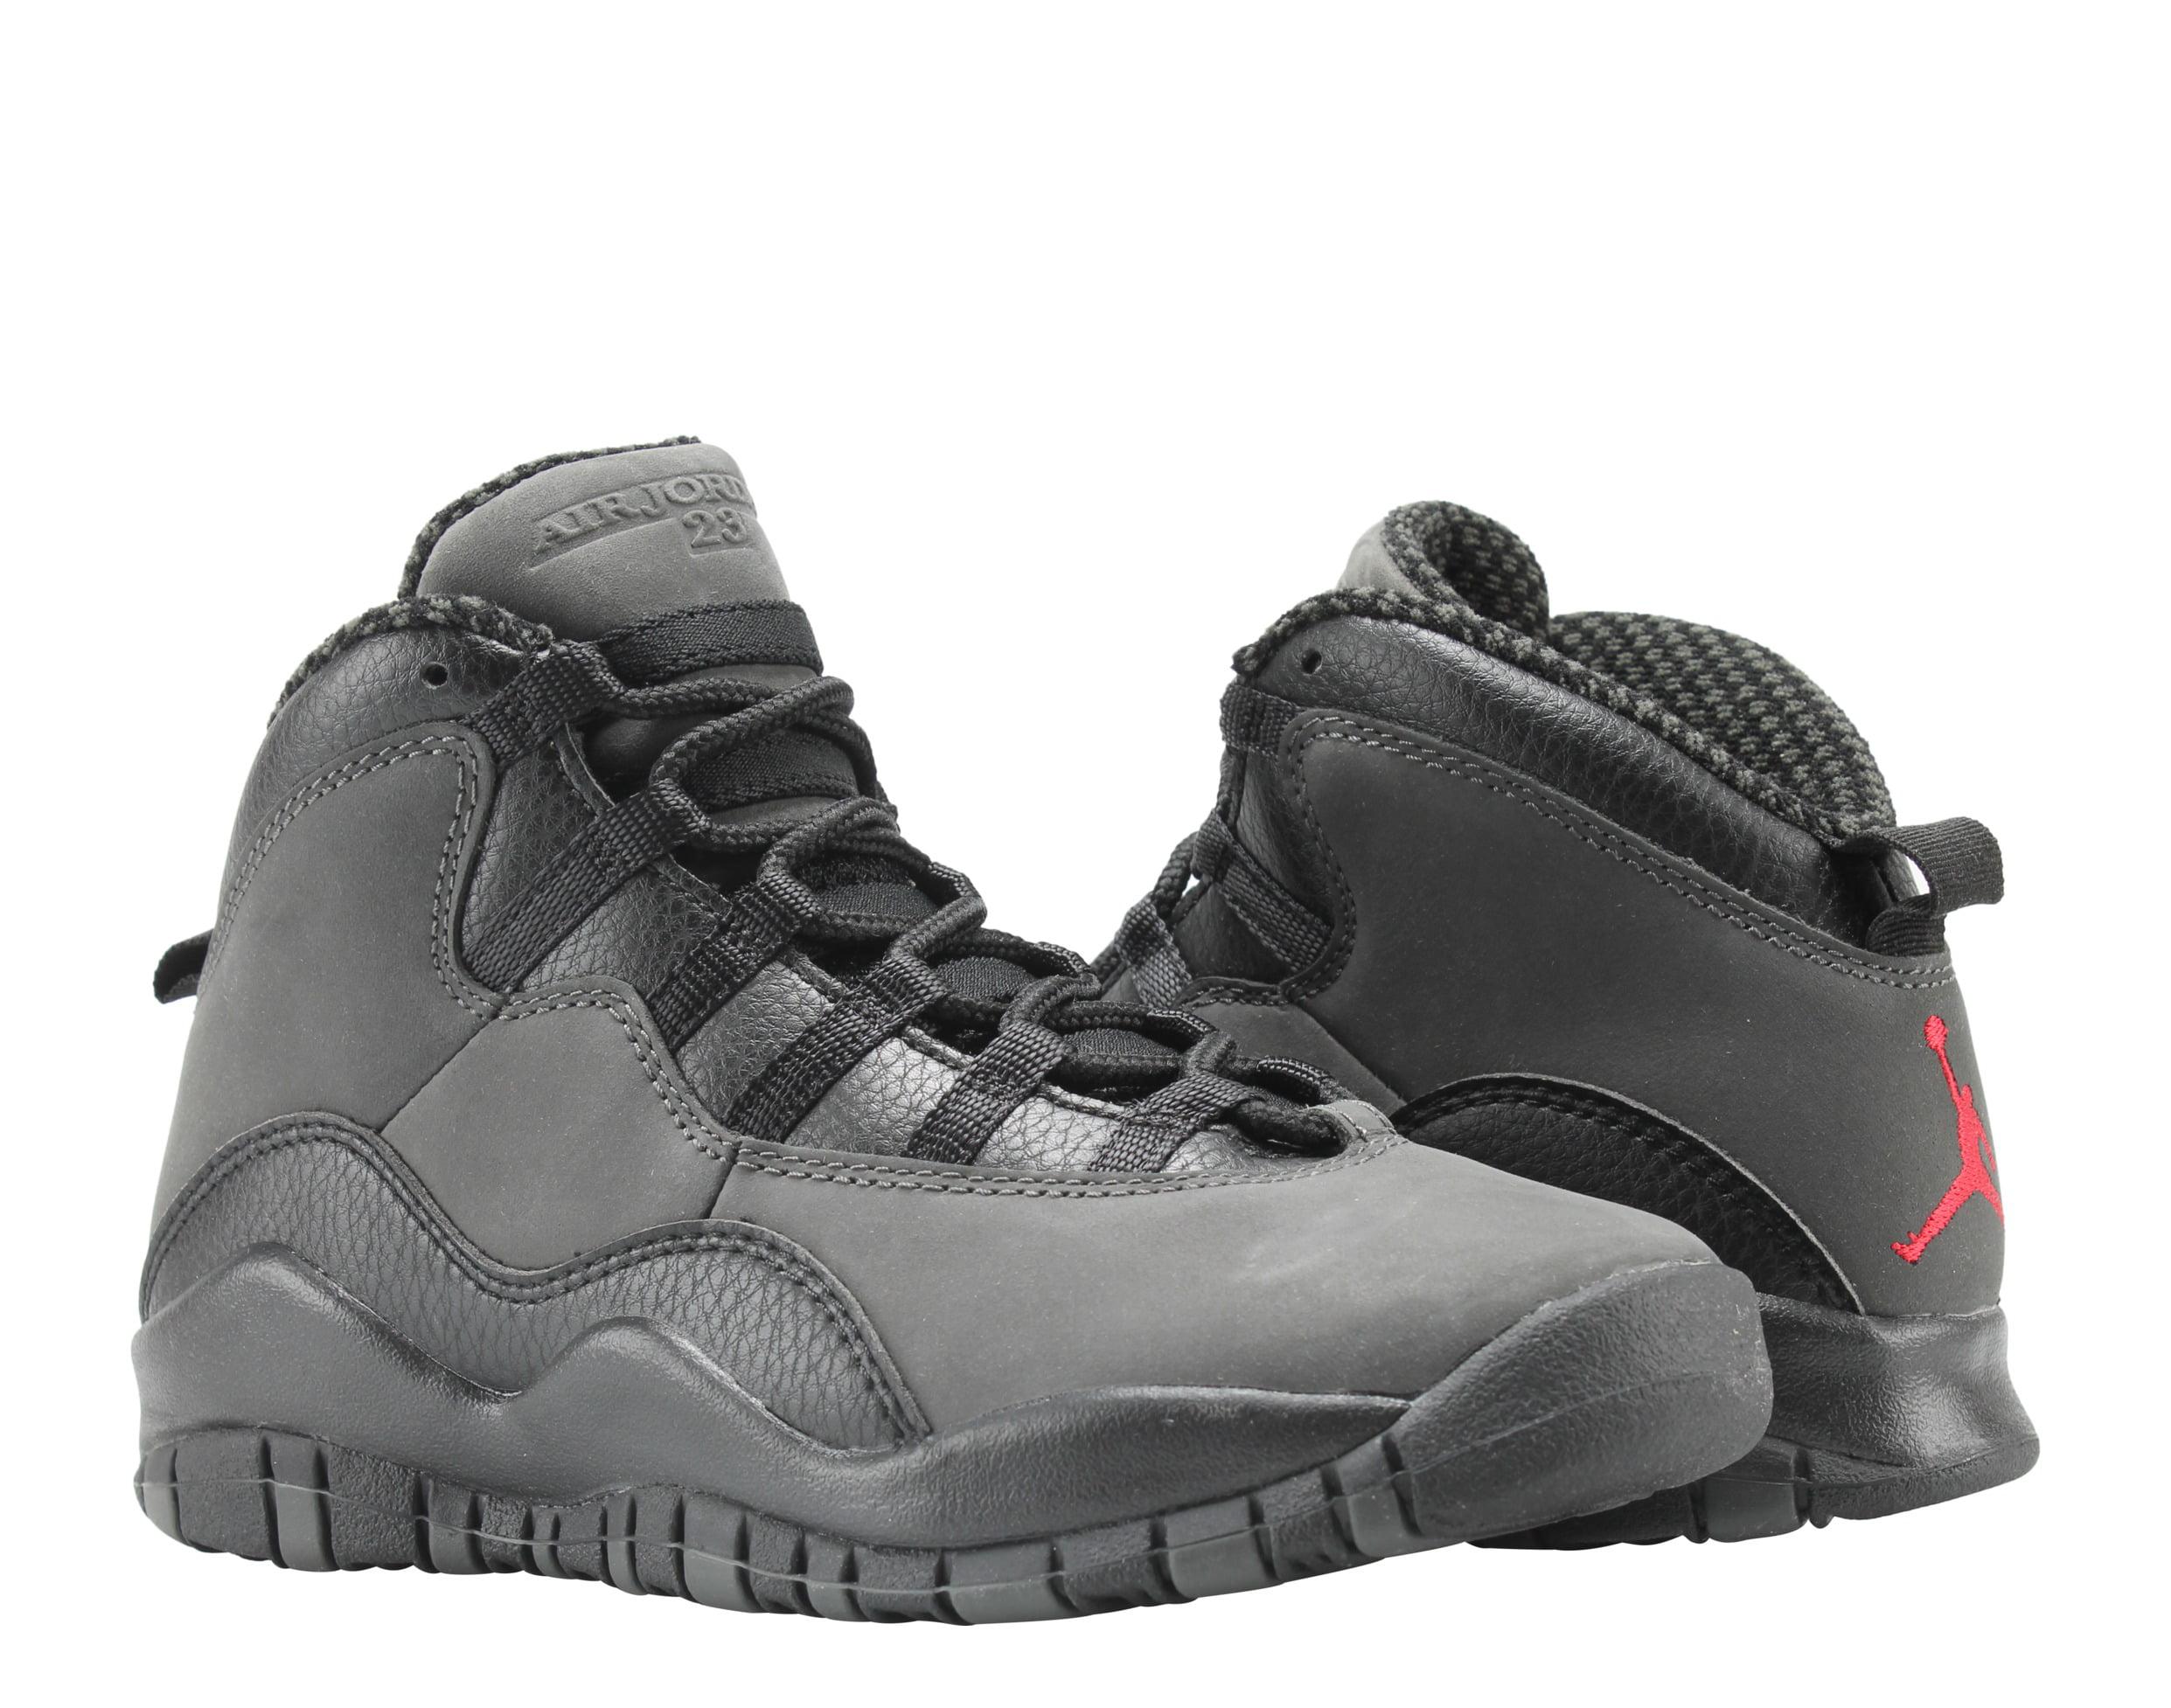 super popular 59209 0b2b3 ... get nike air jordan 10 retro bg dark shadow big kids basketball shoes  310806 002 walmart